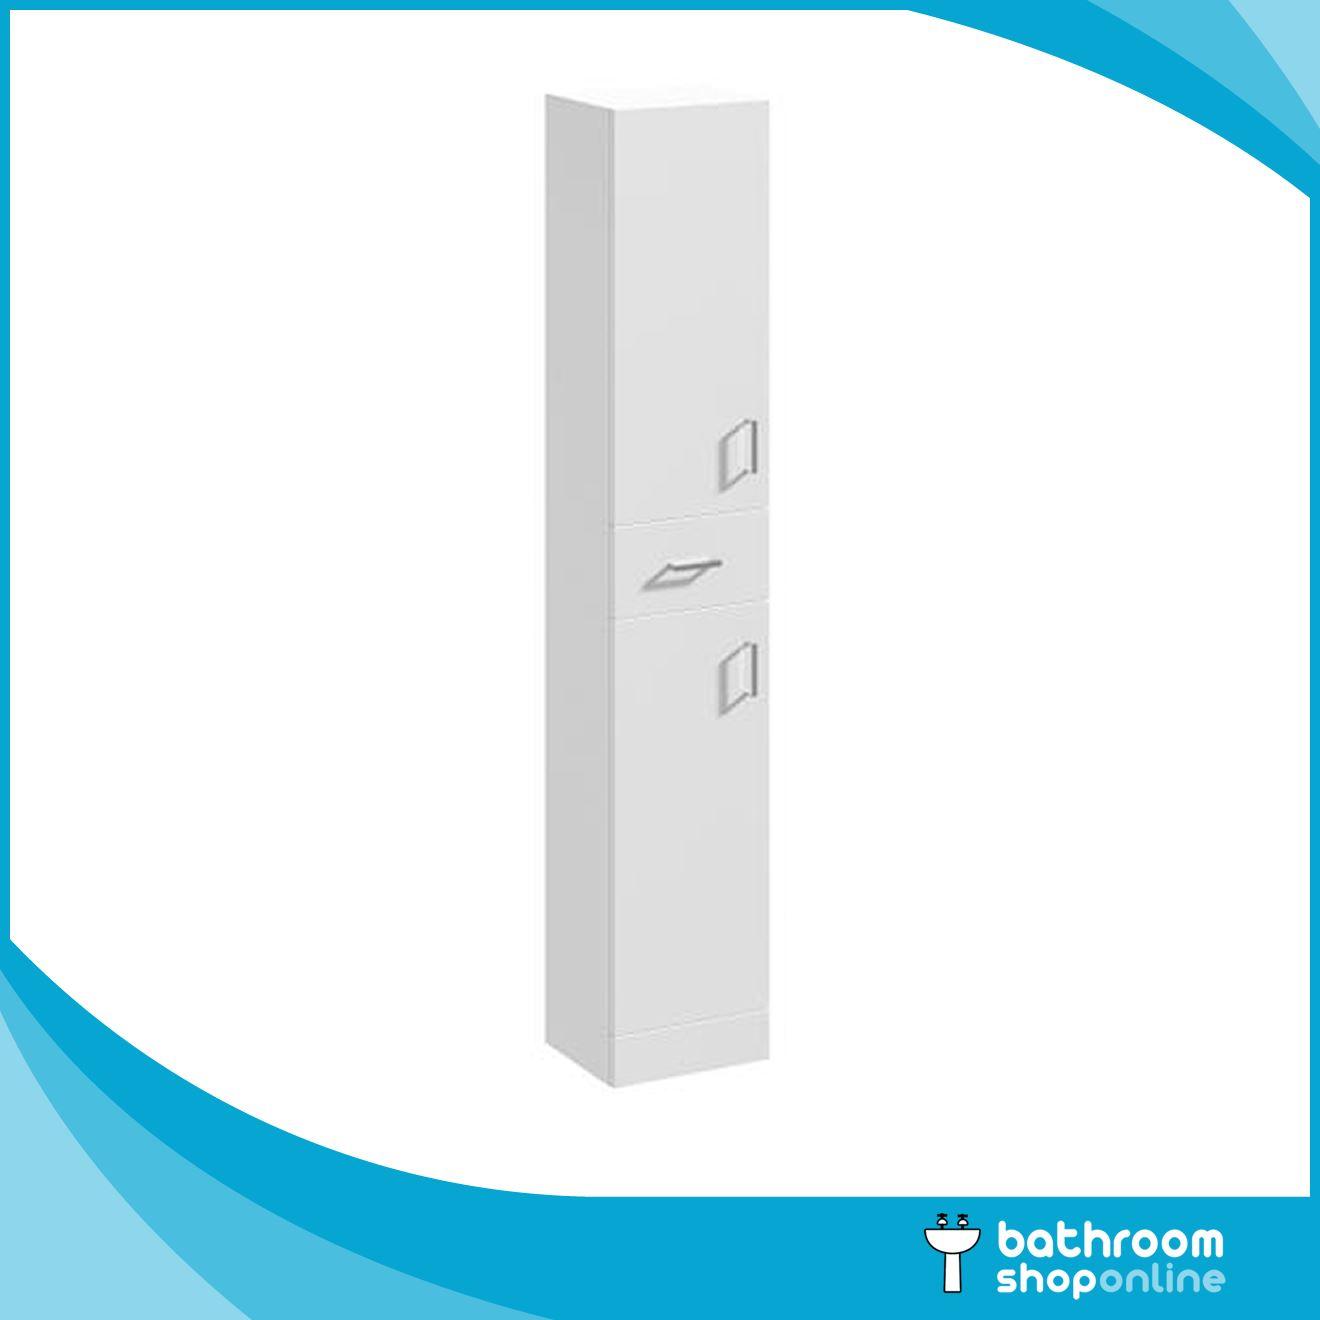 Bathroom Furniture Gloss White Cabinet Storage Vanity Unit Basin Sink Ebay